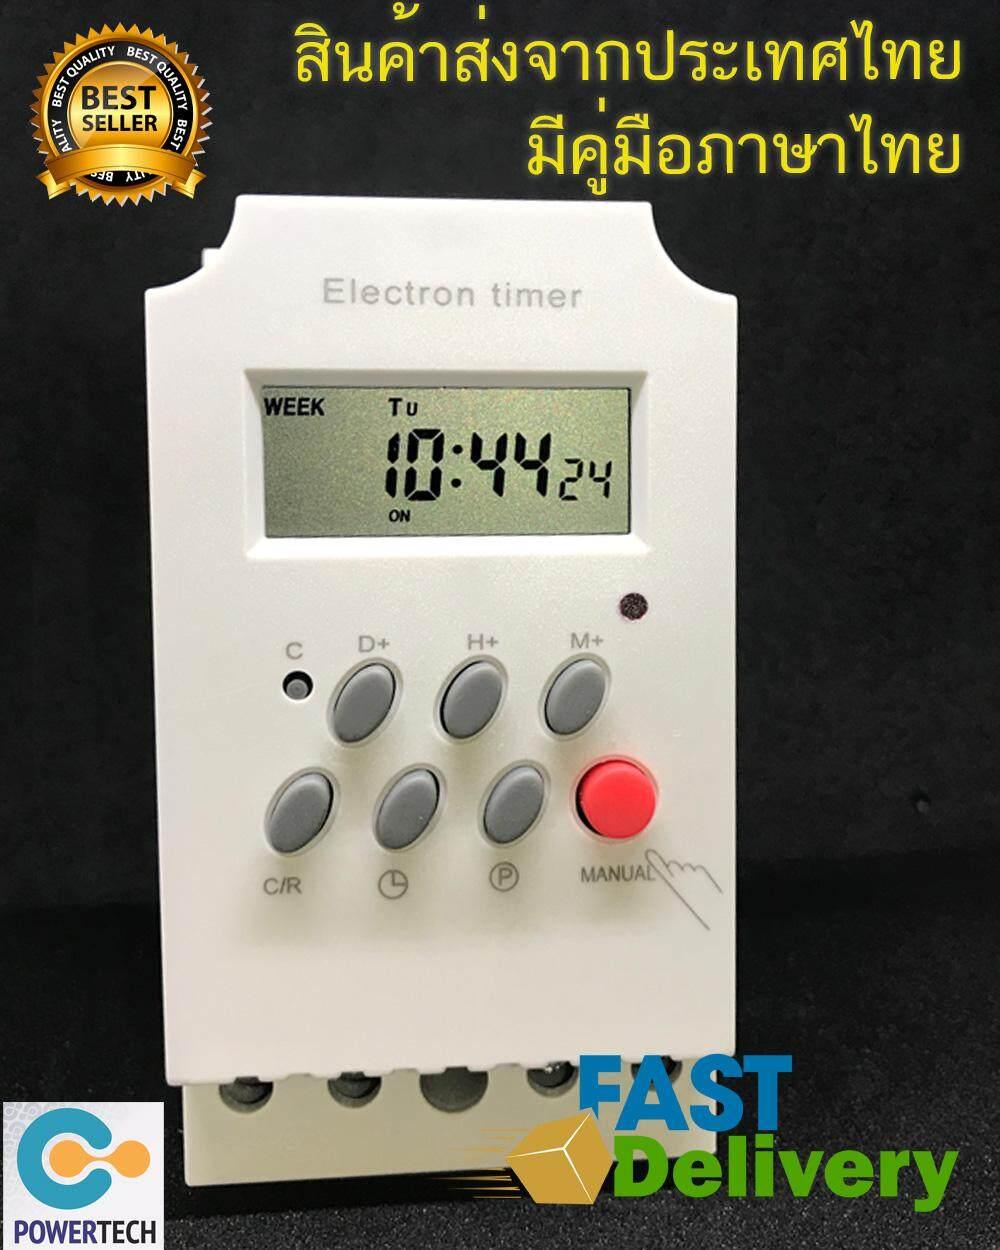 Timer Switch ทามเมอร์ สวิทซ์ ตั้งเวลาเปิด-อัตโนมัติ By Power Tech.